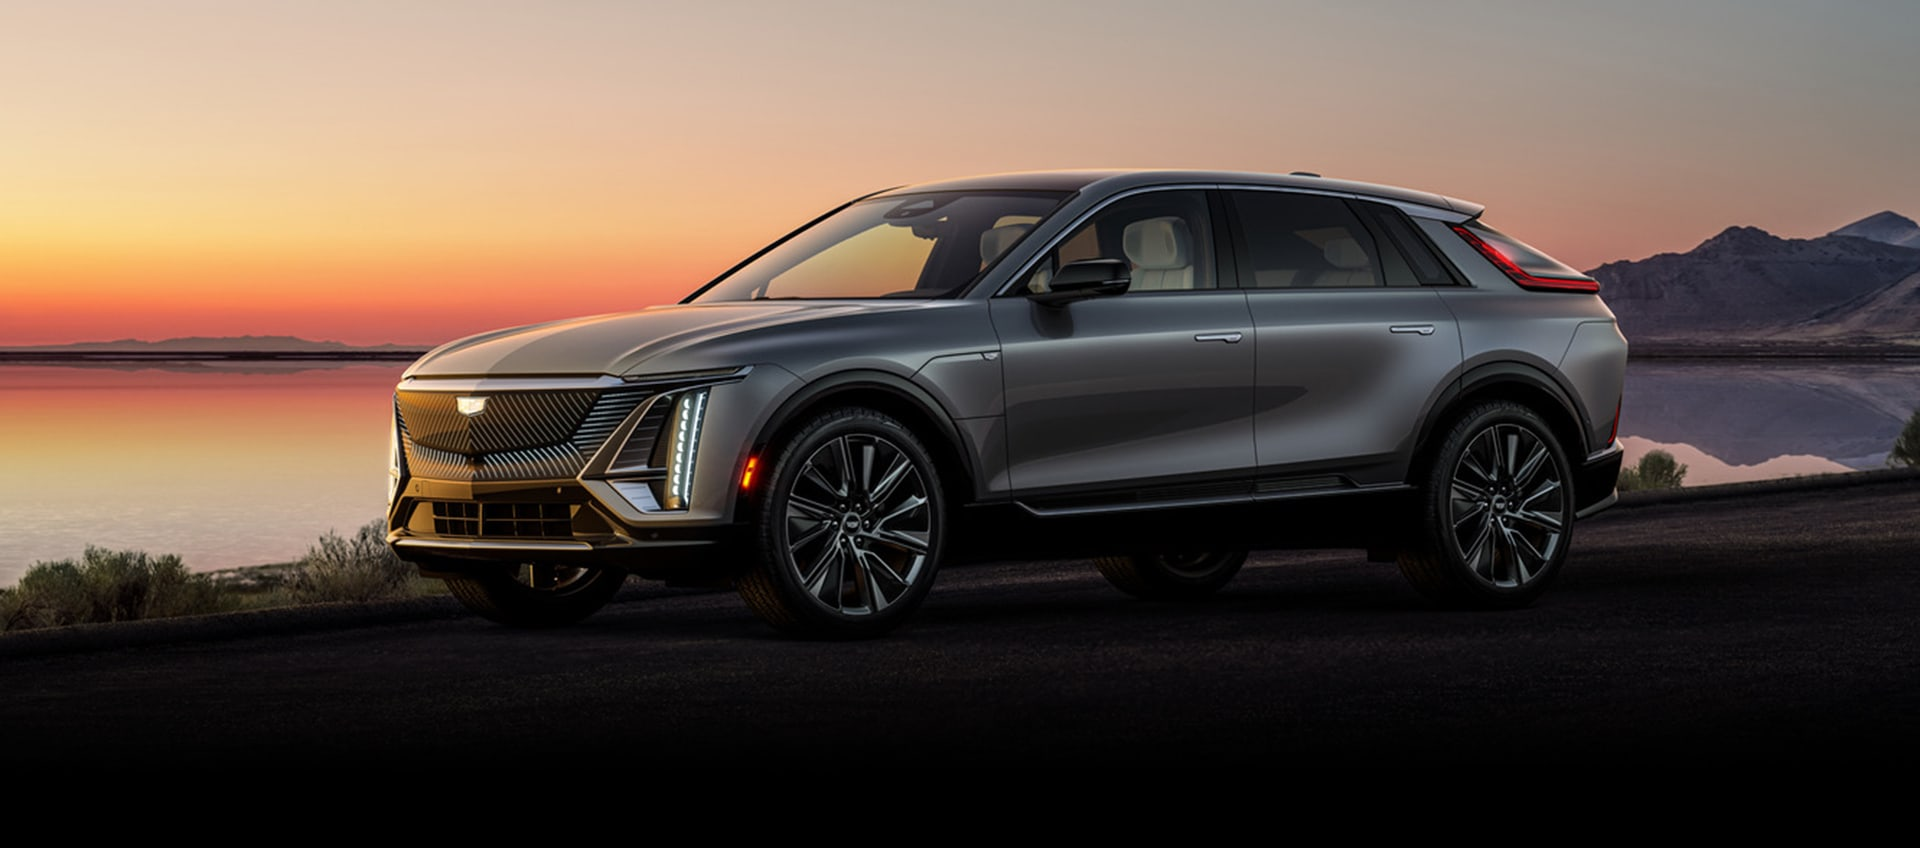 2023 Cadillac Lyriq parked near a mountain lake